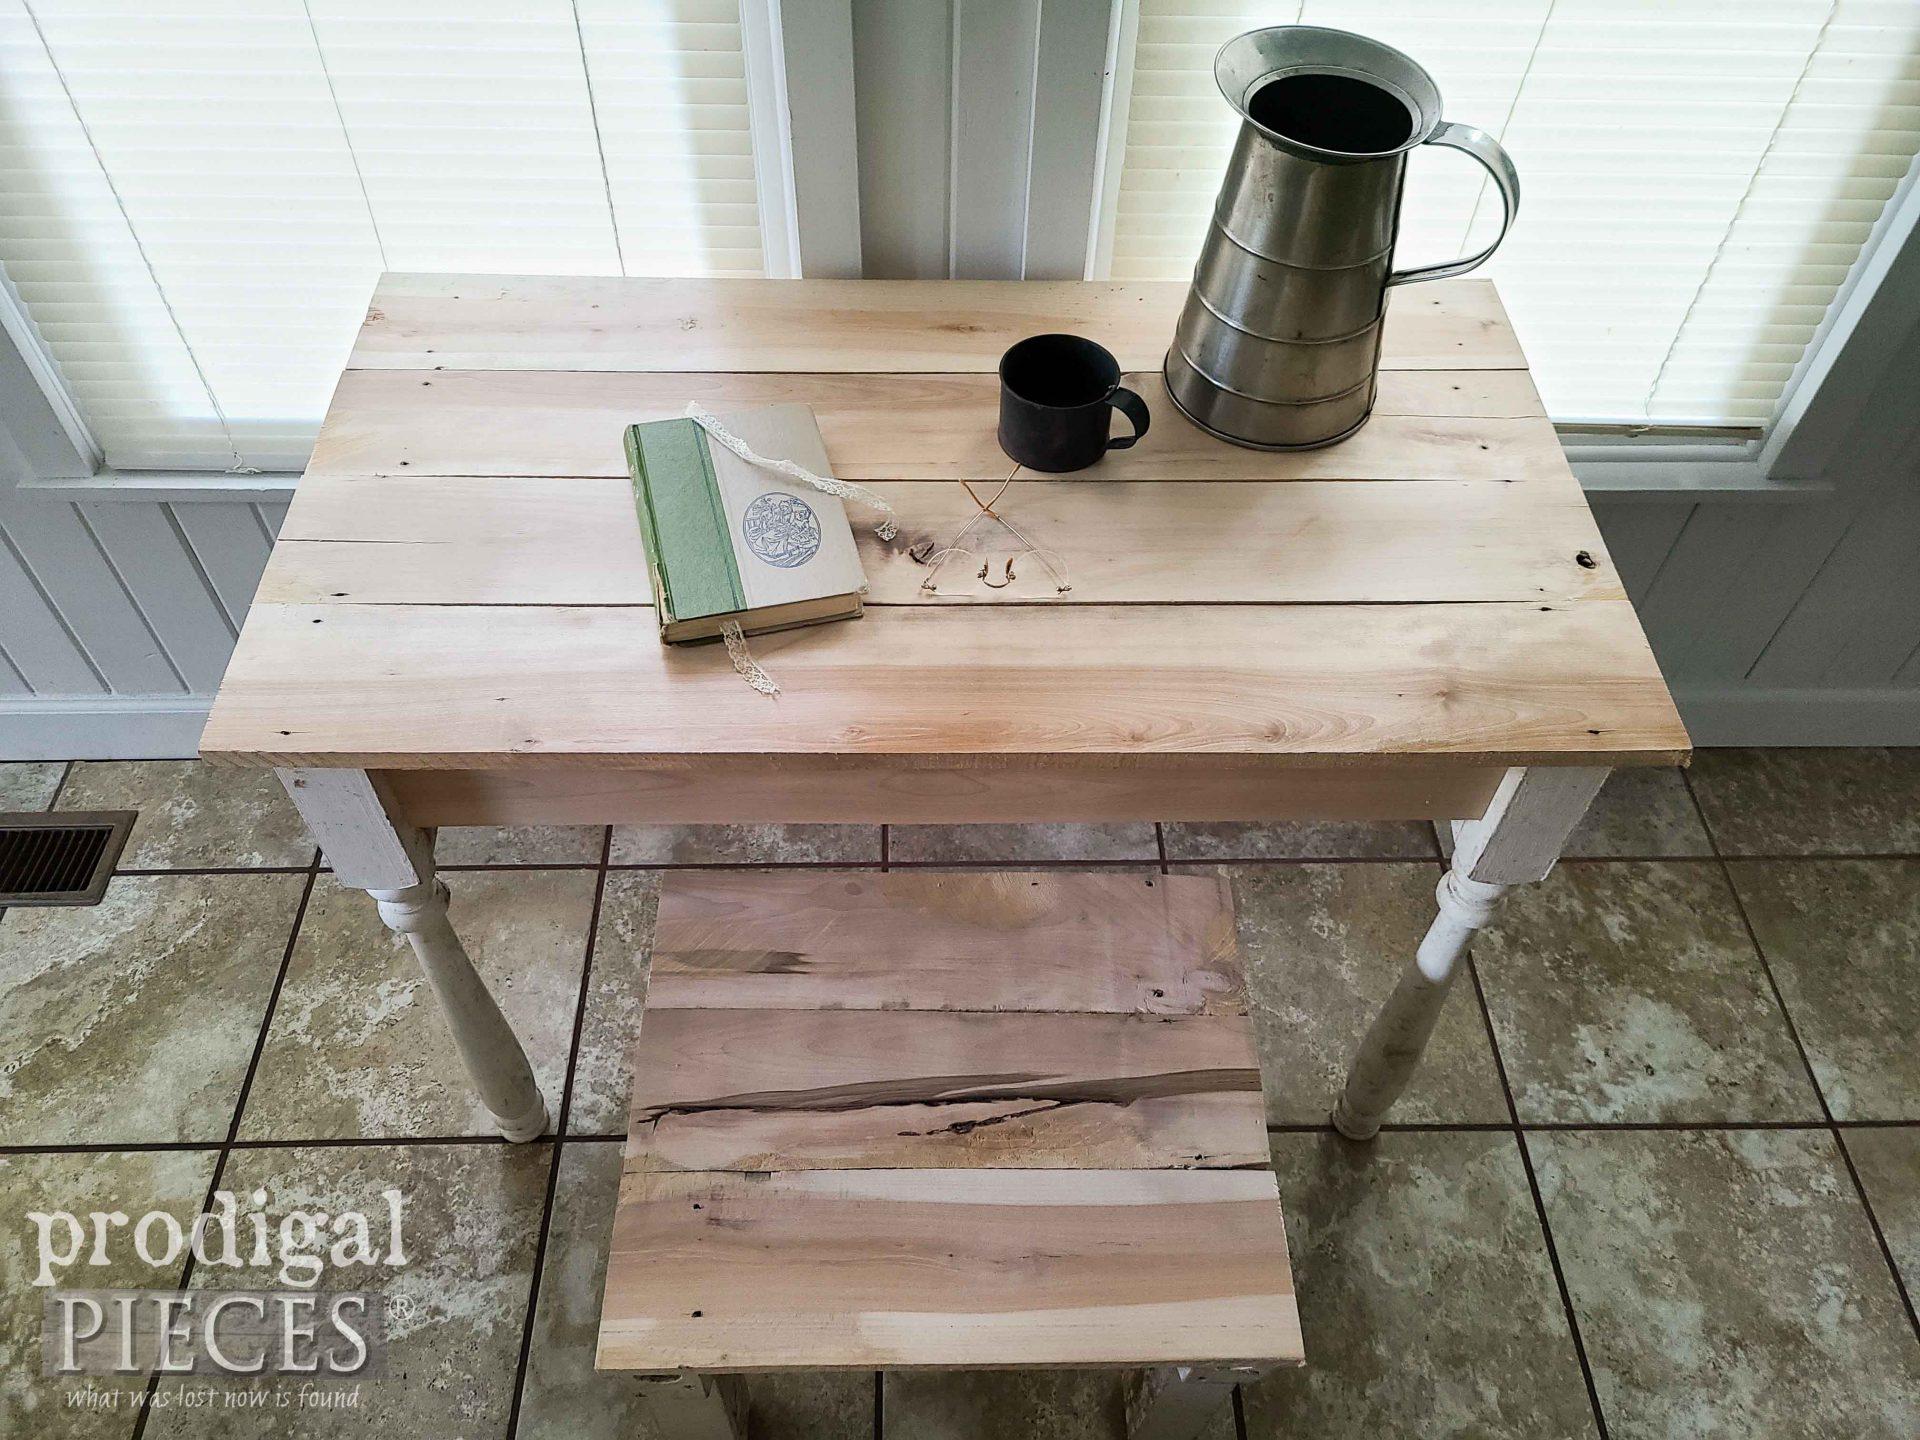 Reclaimed Wood Plank Wood Desk Set by Larissa of Prodigal Pieces | prodigalpieces.com #prodigalpieces #reclaimed #wood #farmhouse #woodworking #diy #home